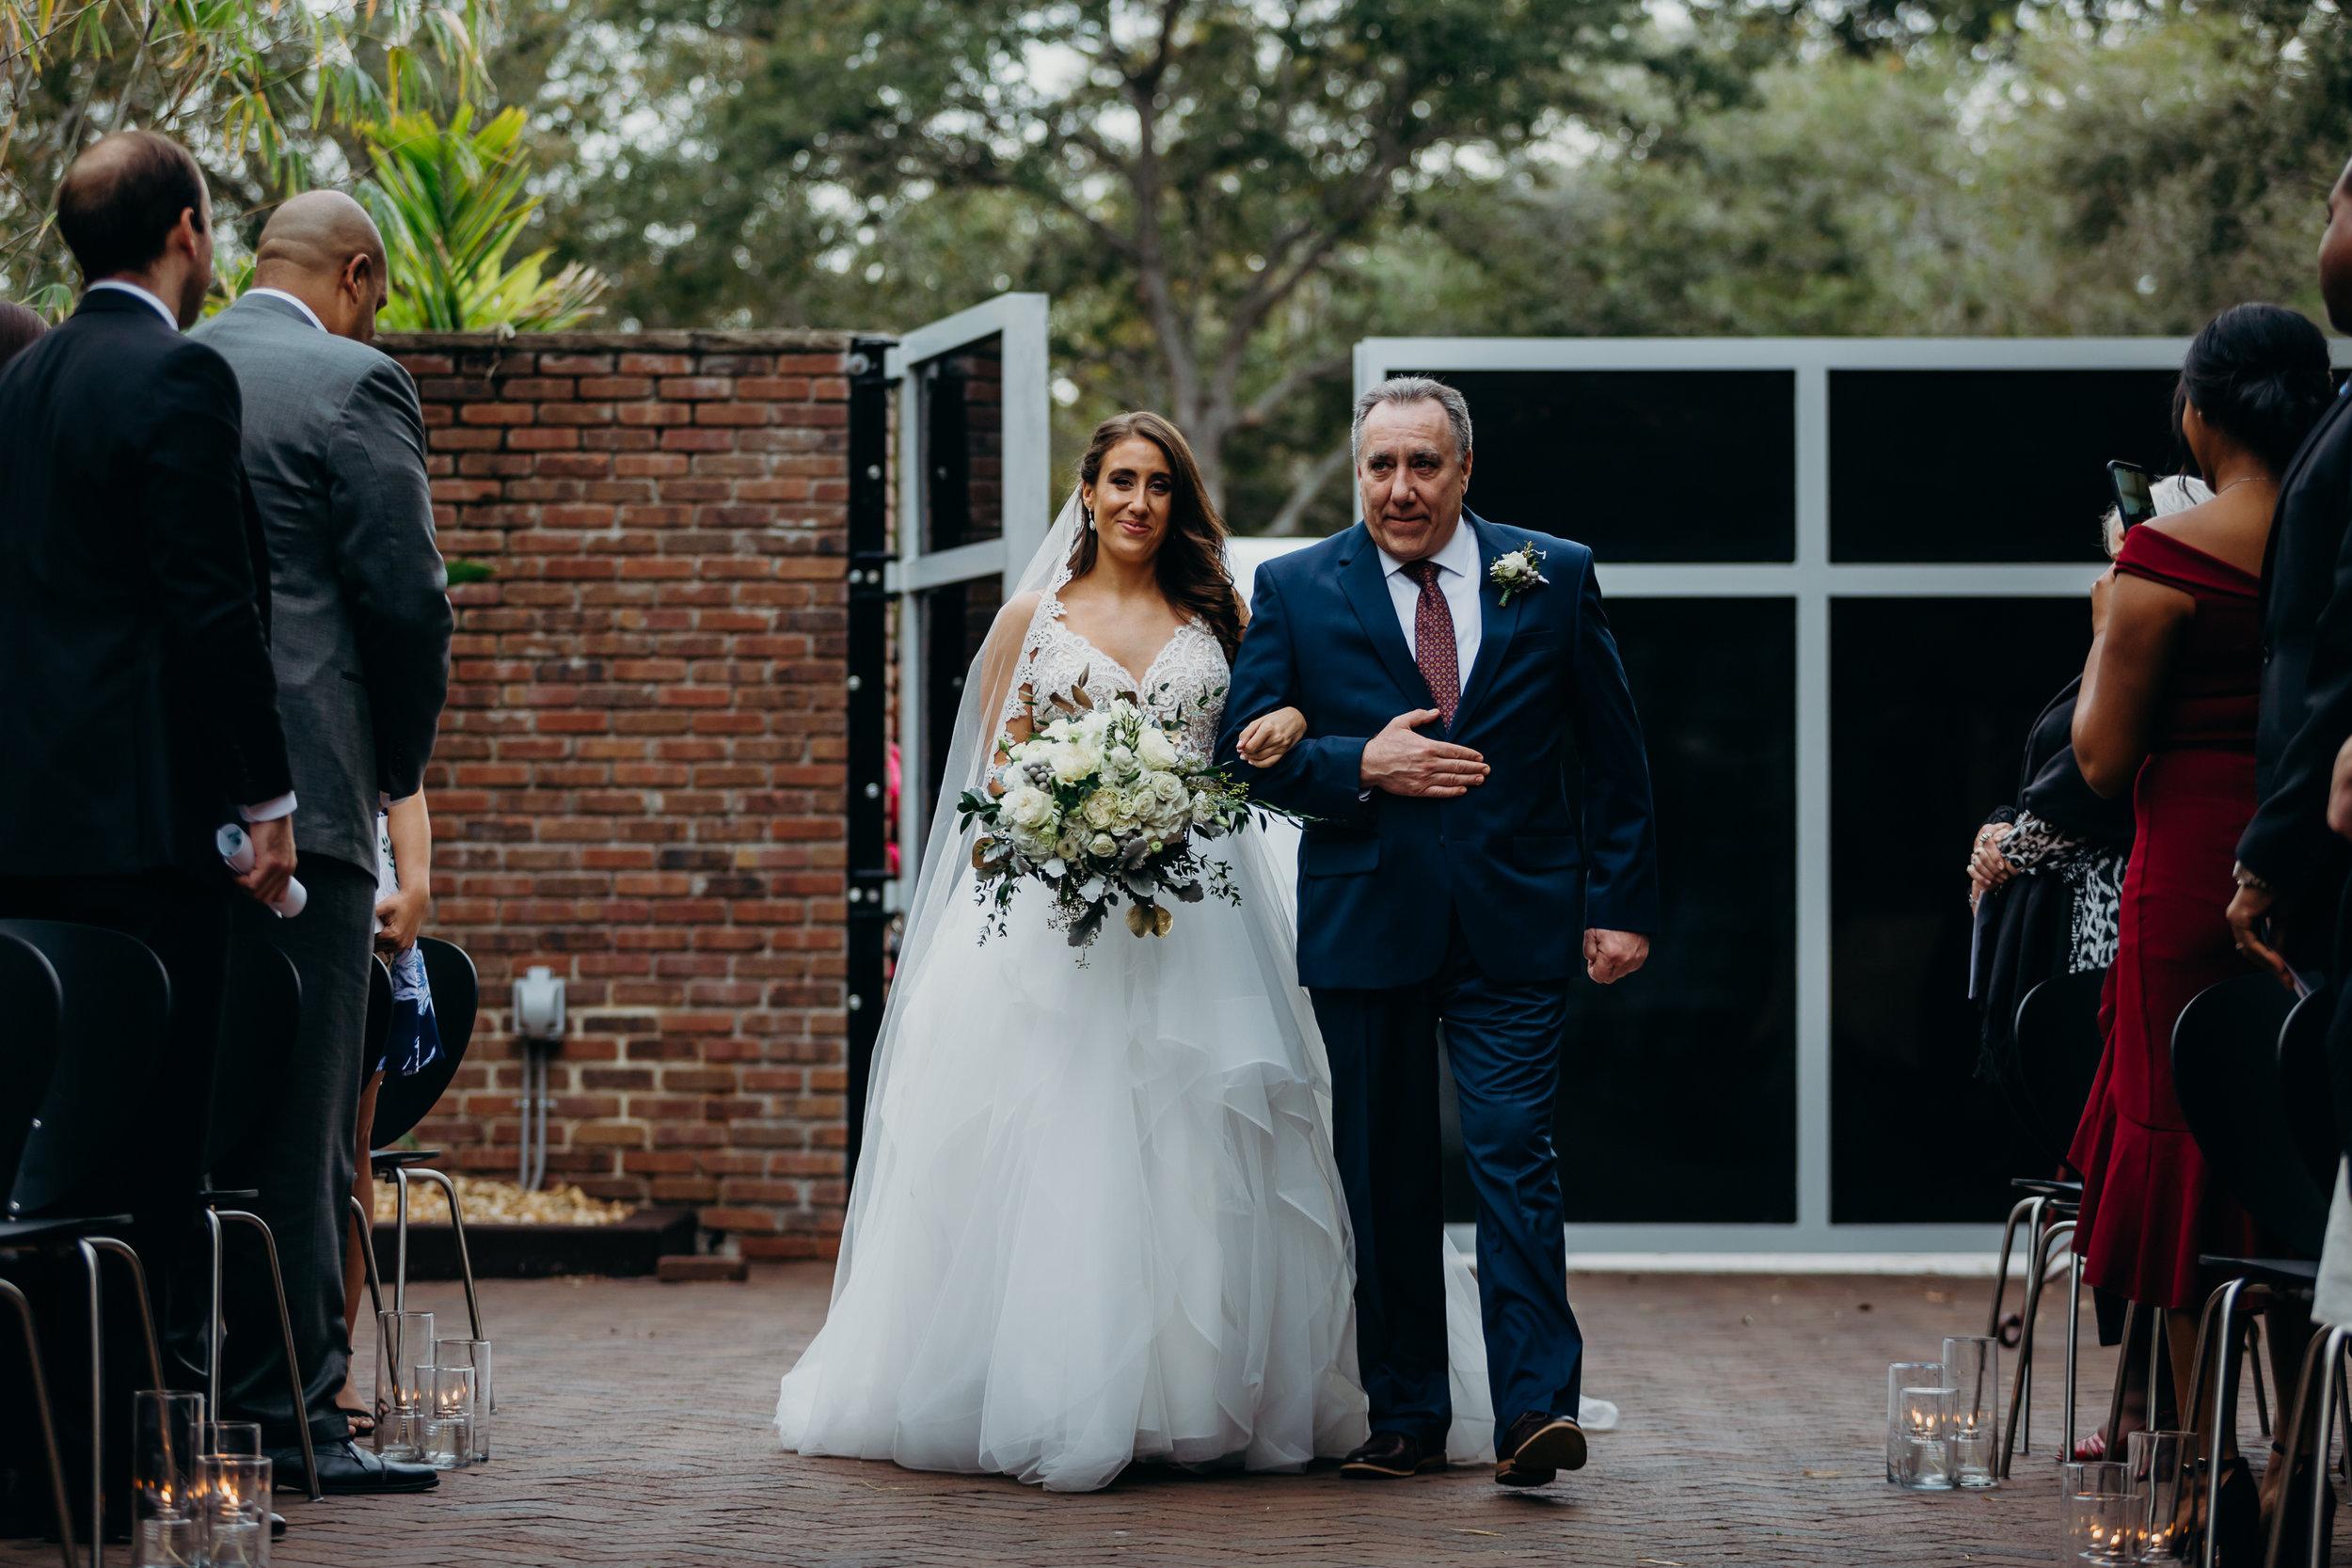 Gianna Keiko Atlanta San Francisco NYC Wedding Engagement Wedding Elopement Photographer_Sneak Peek-54.jpg